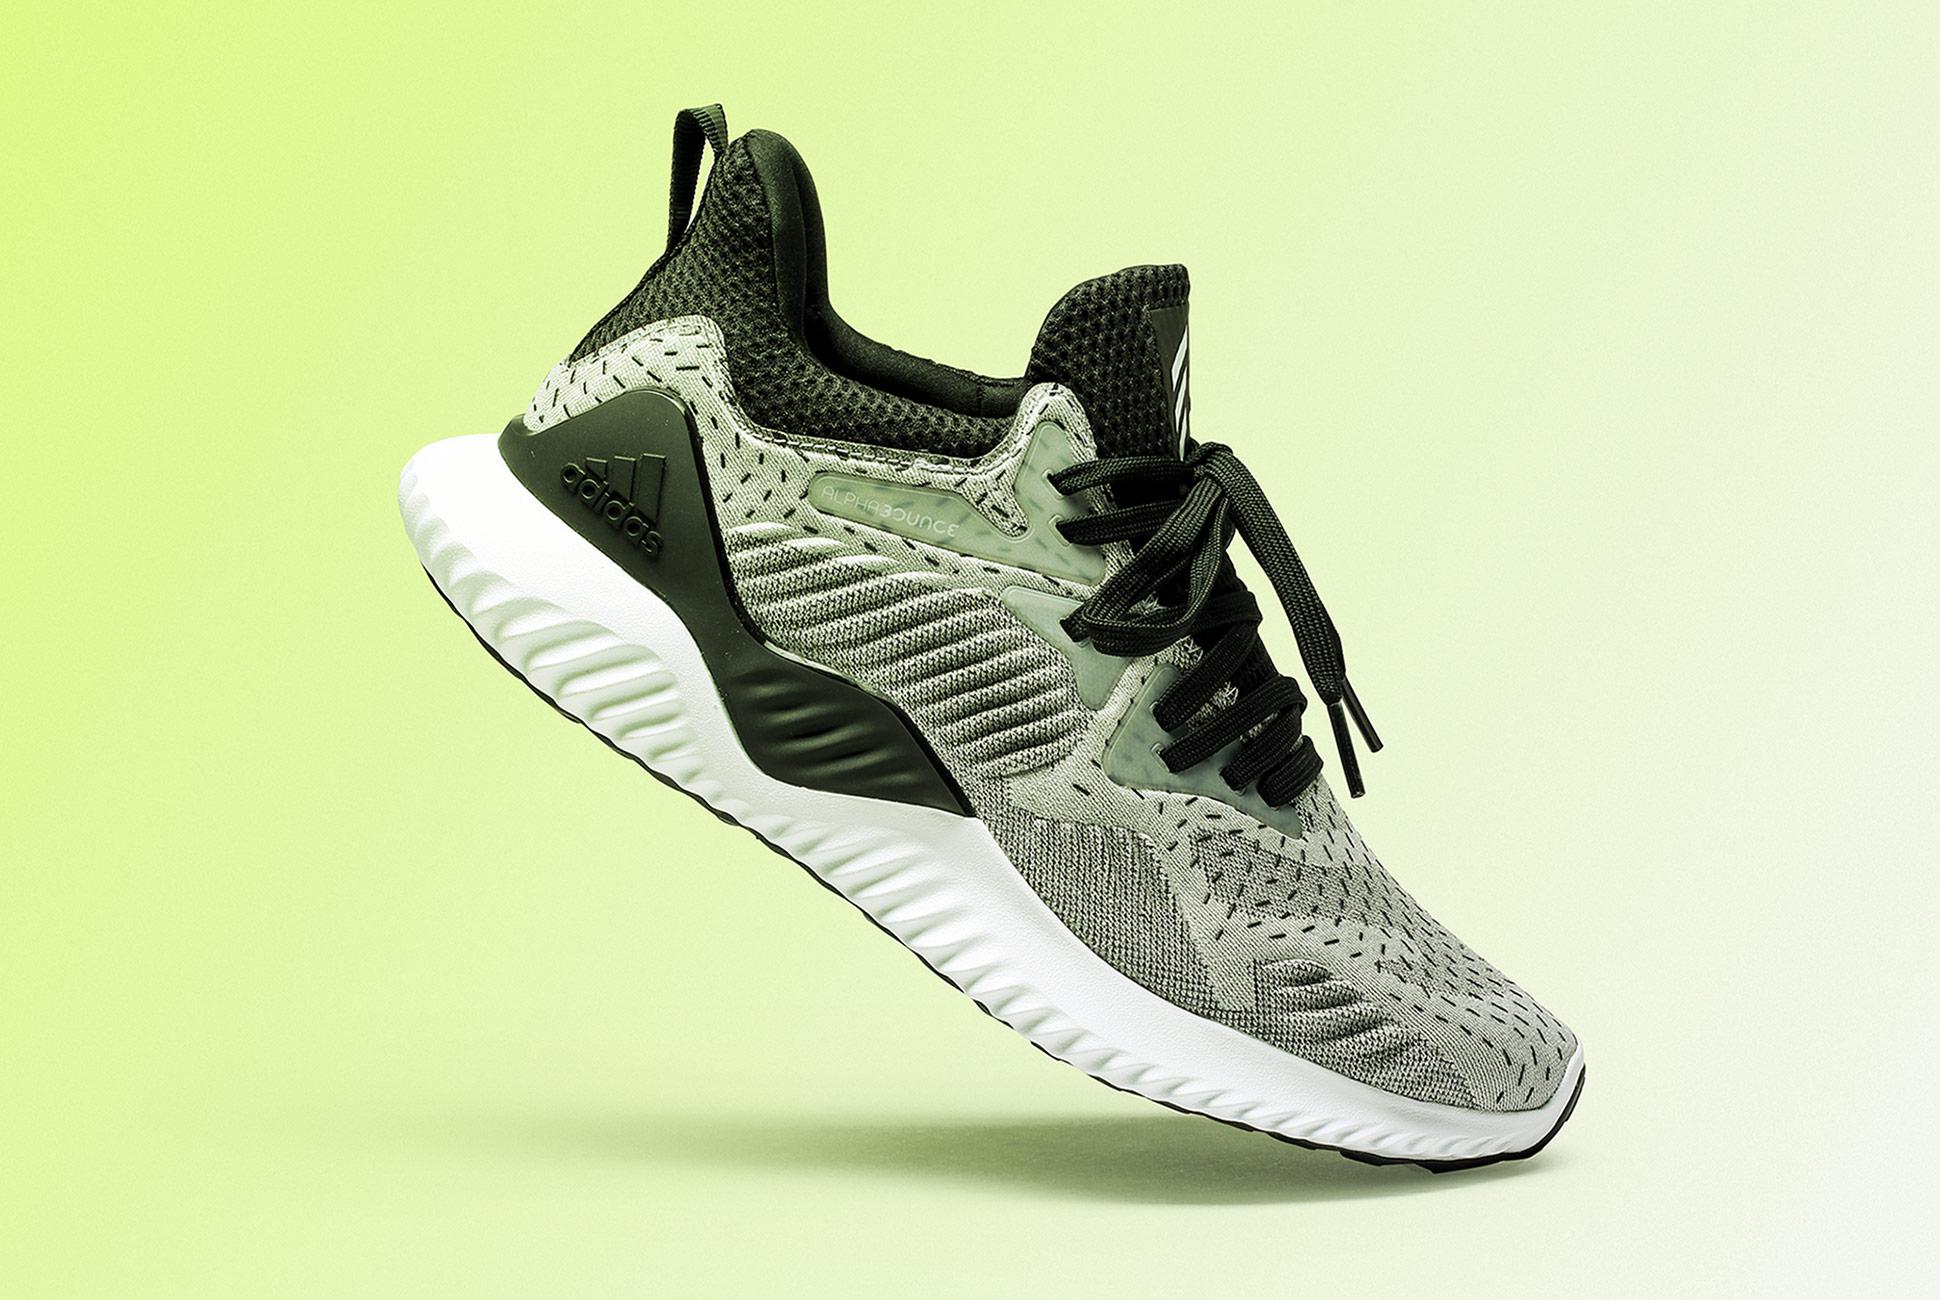 adidas sports shoes latest model